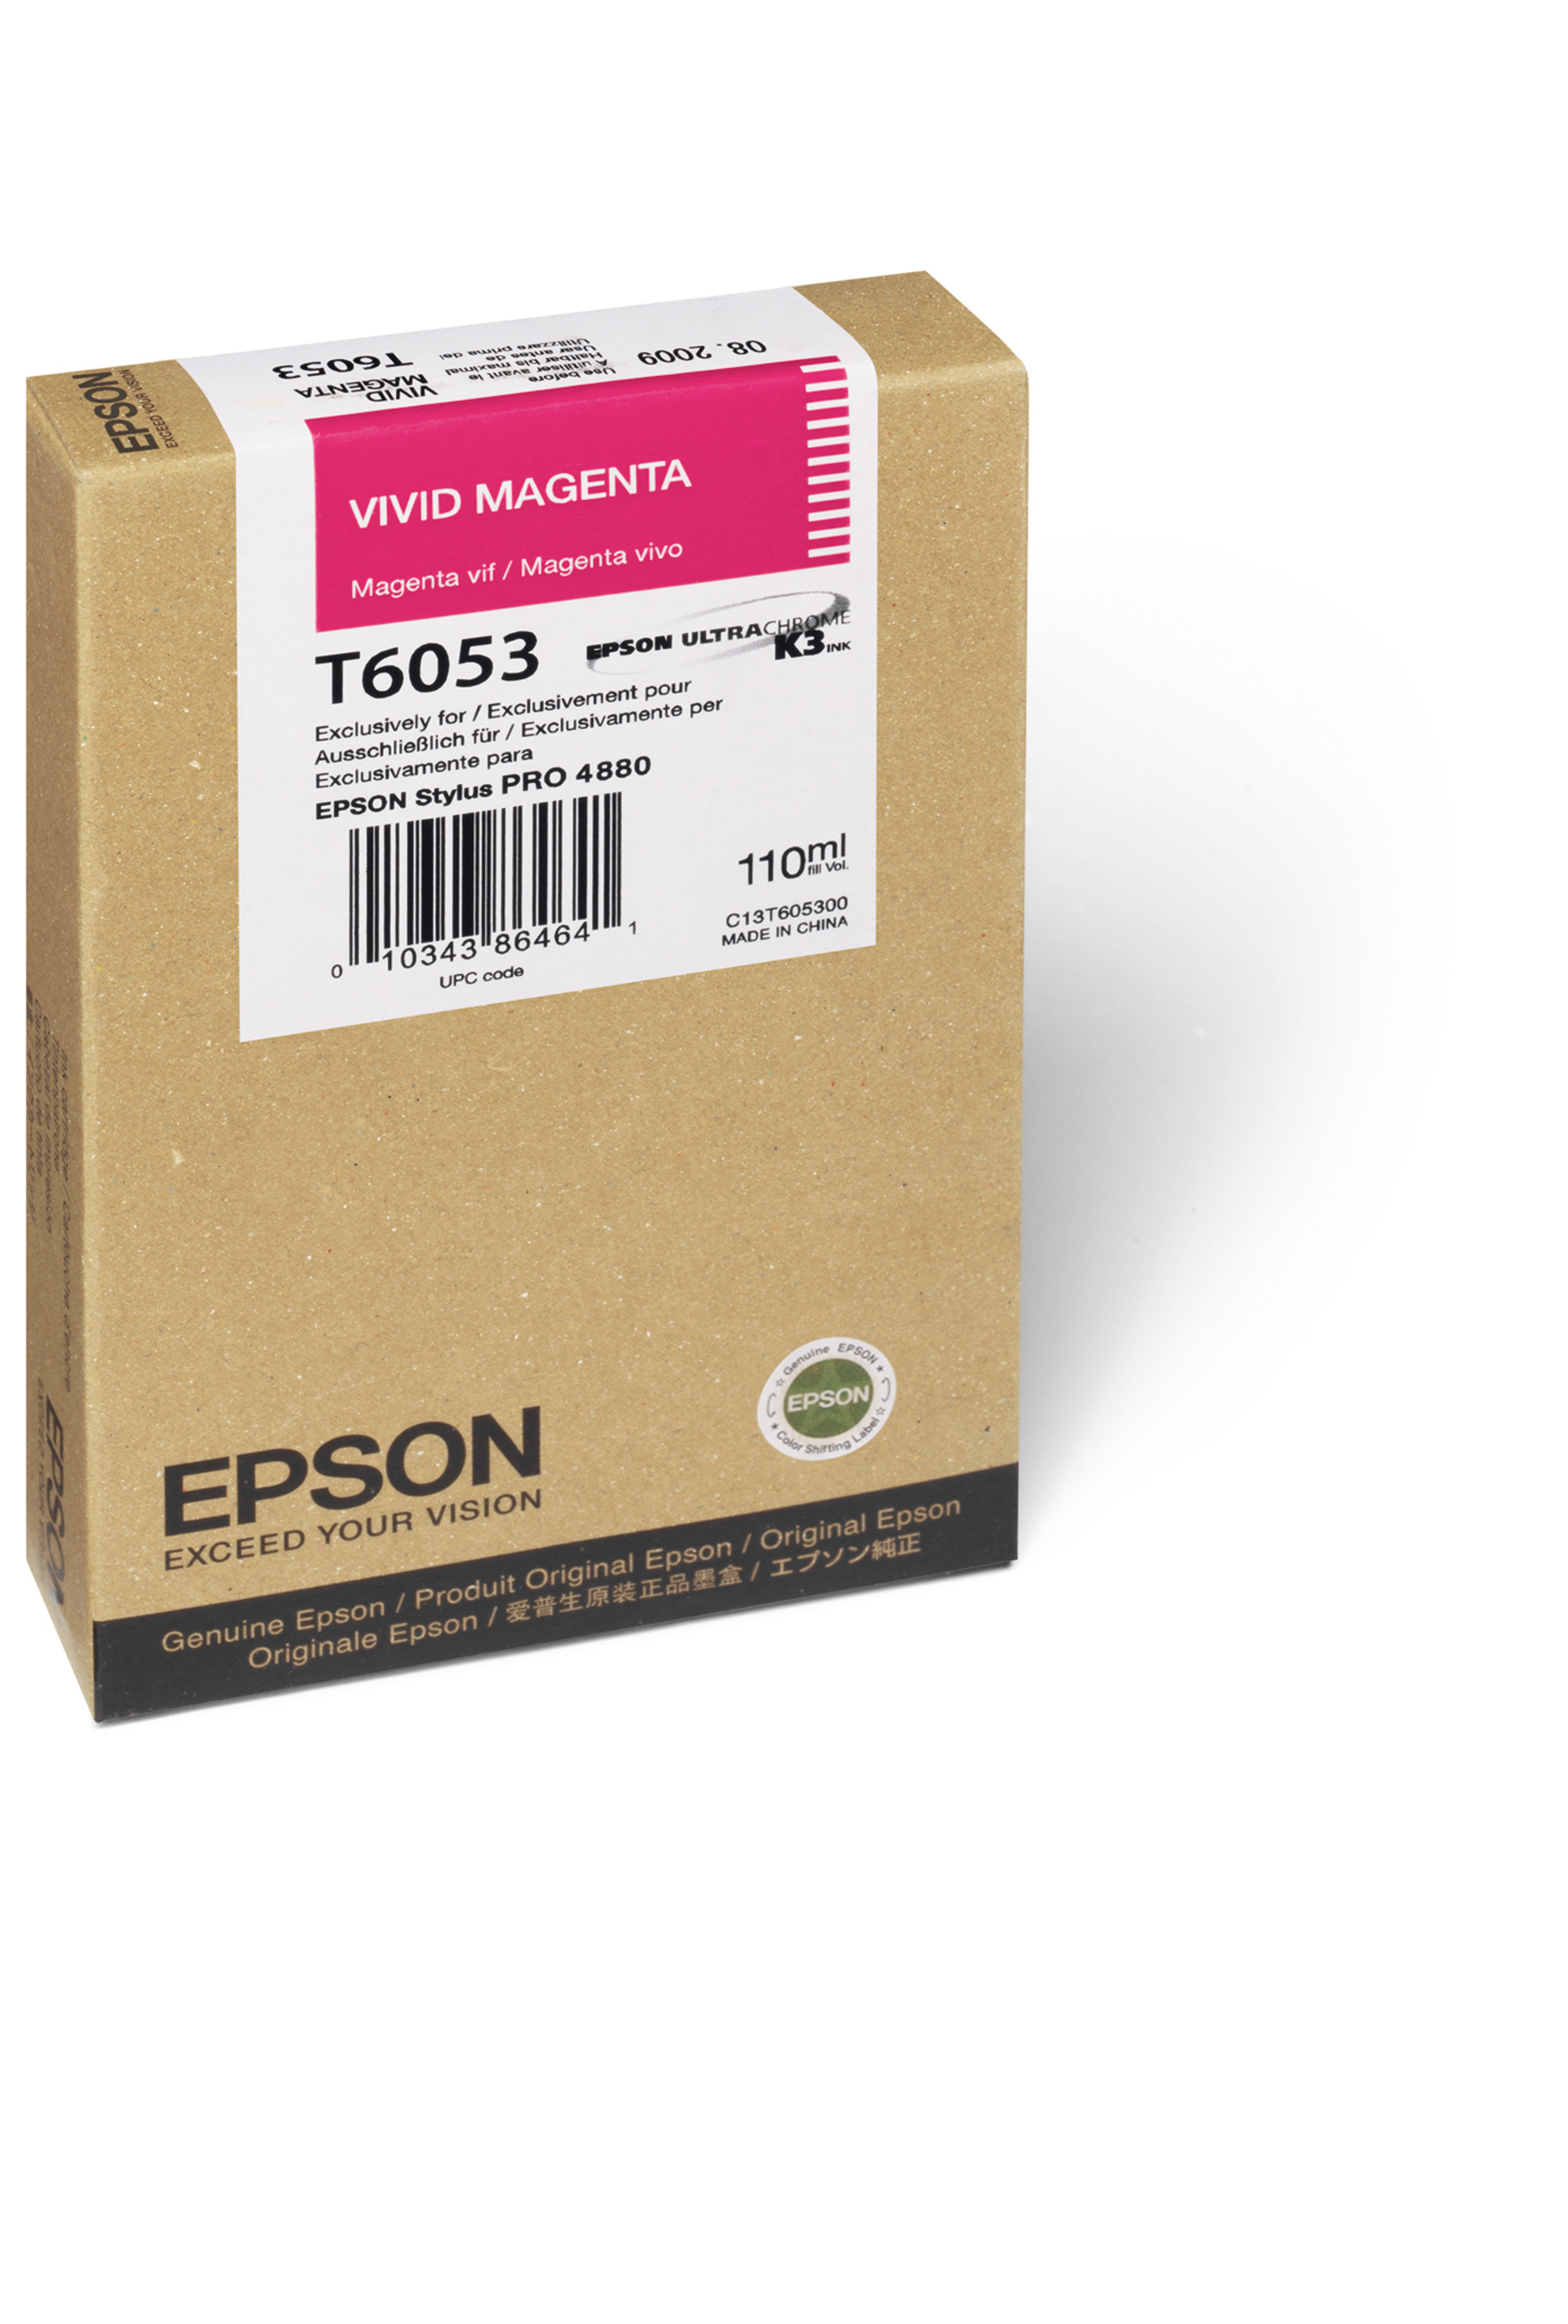 Epson EPSON SD MAGENTA INK (110 ML) (T605B00)